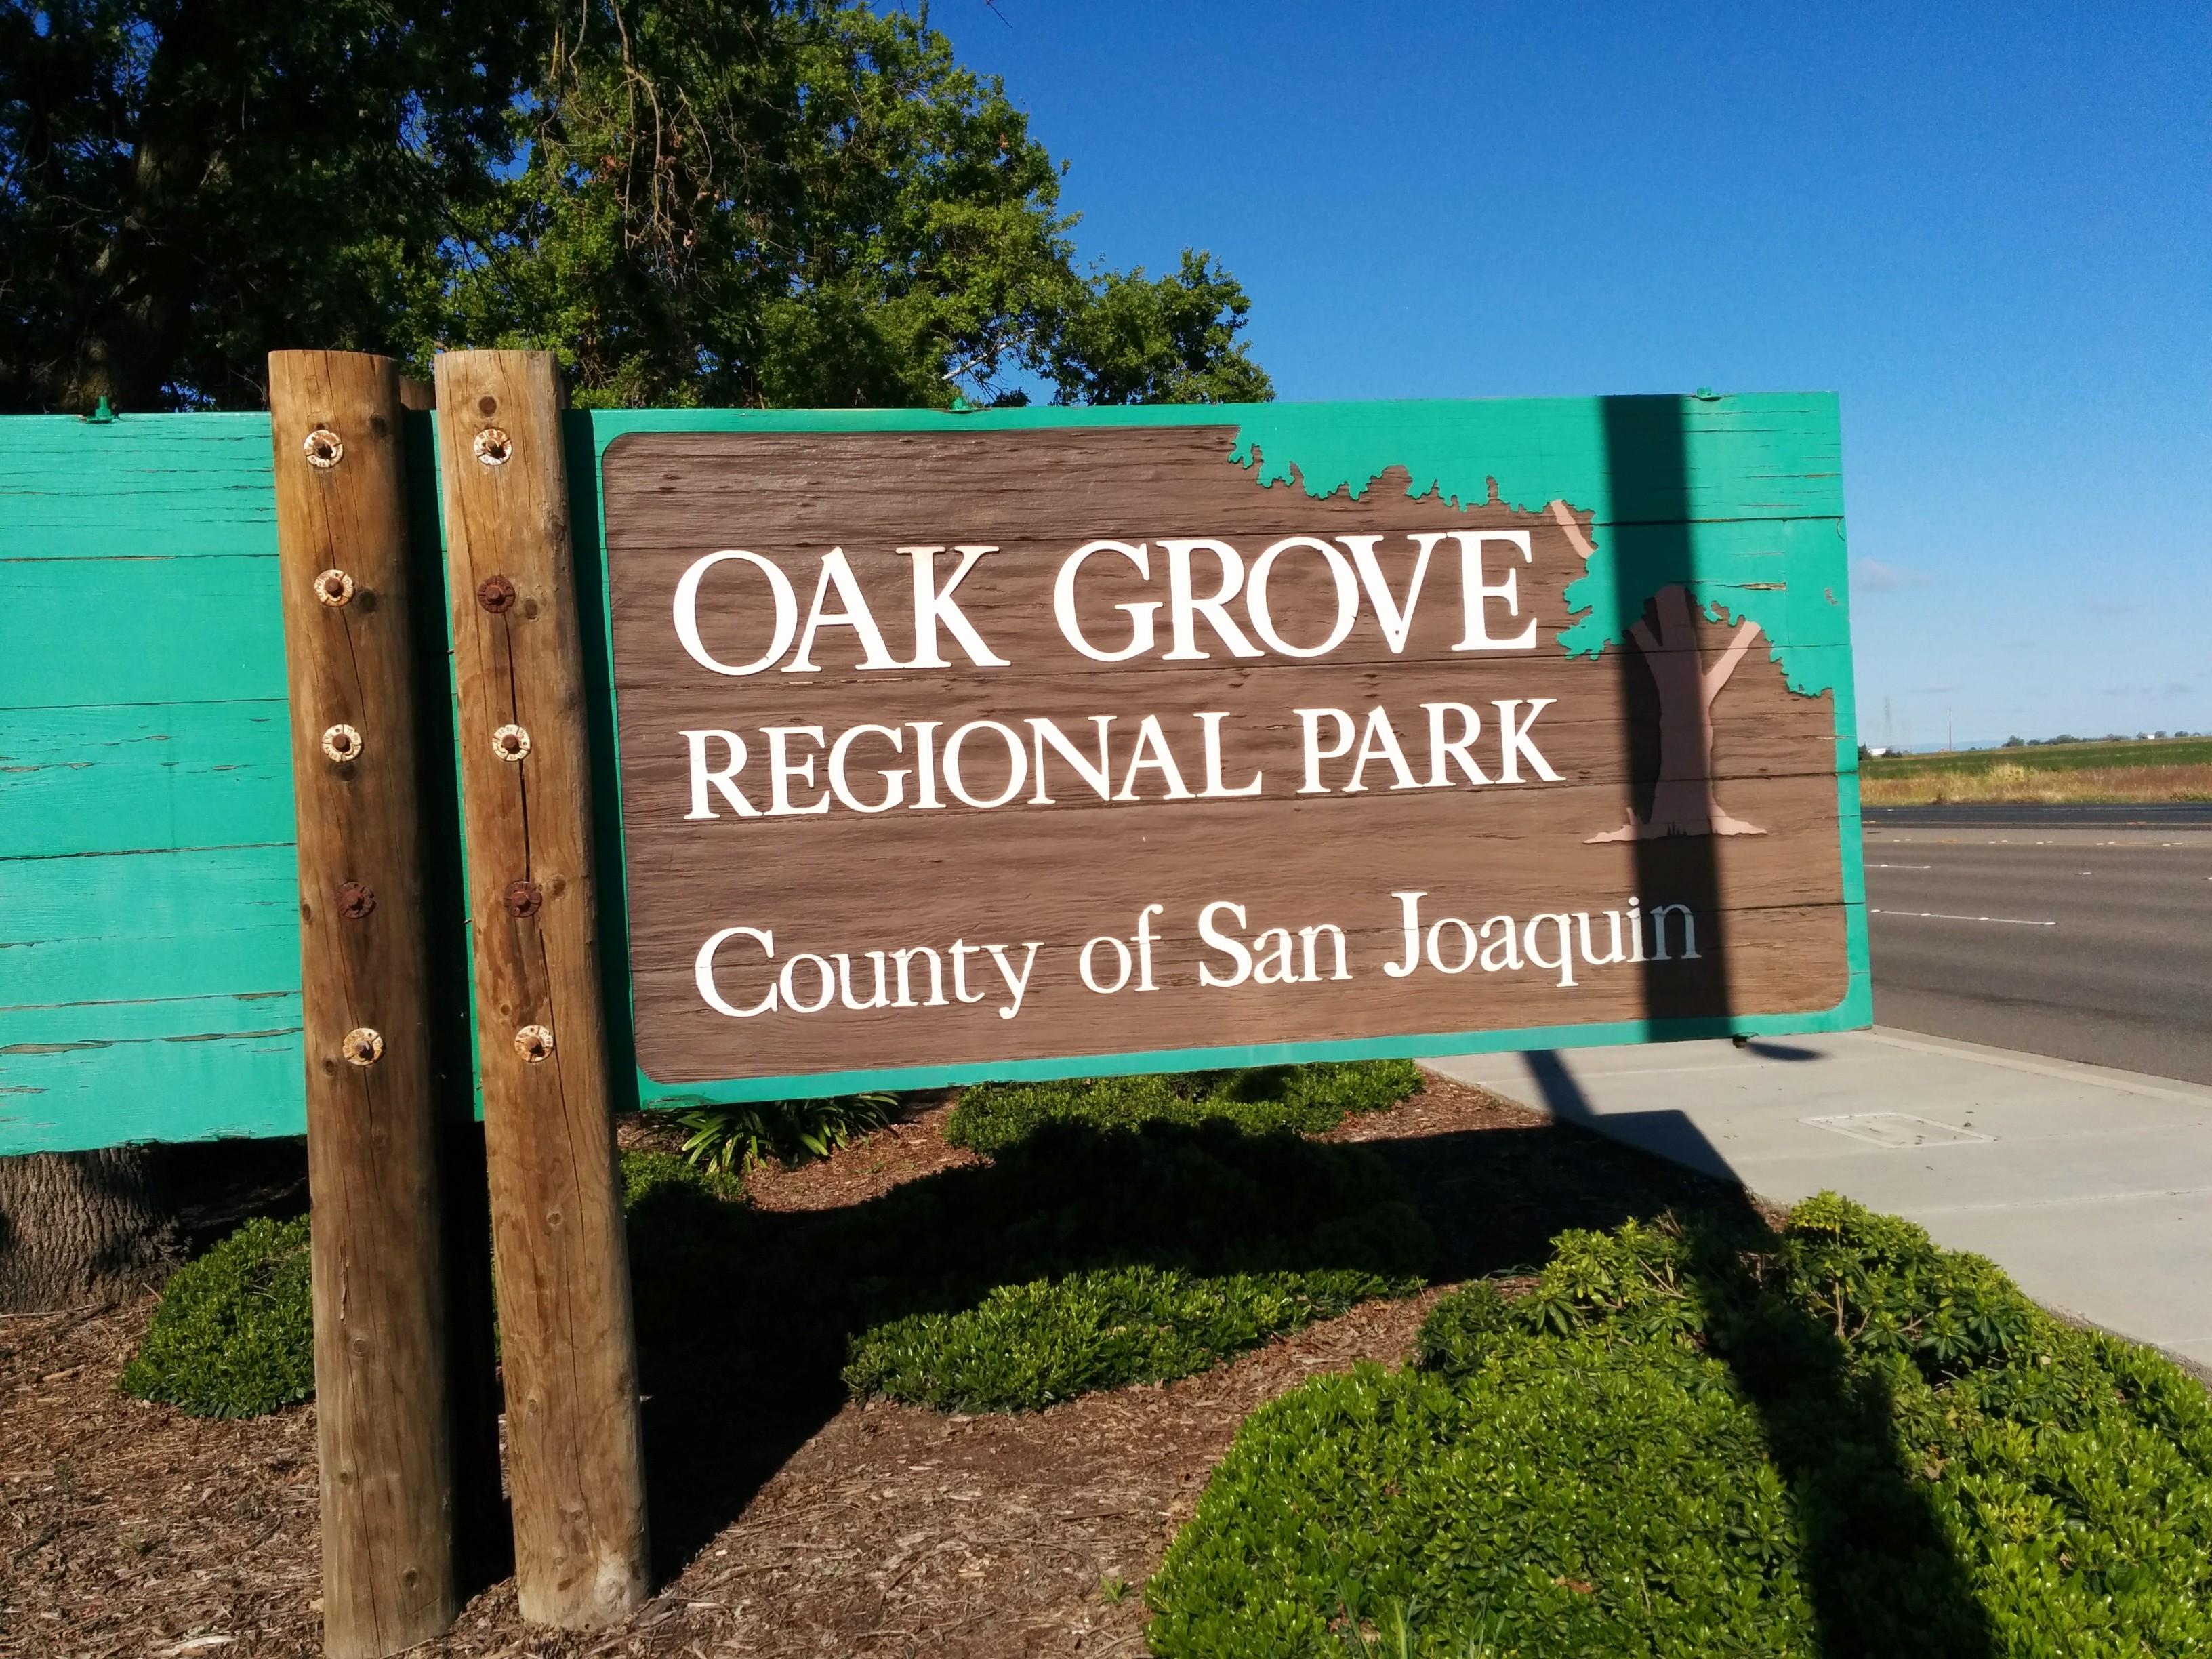 The tragedy of Oak Grove Regional Park